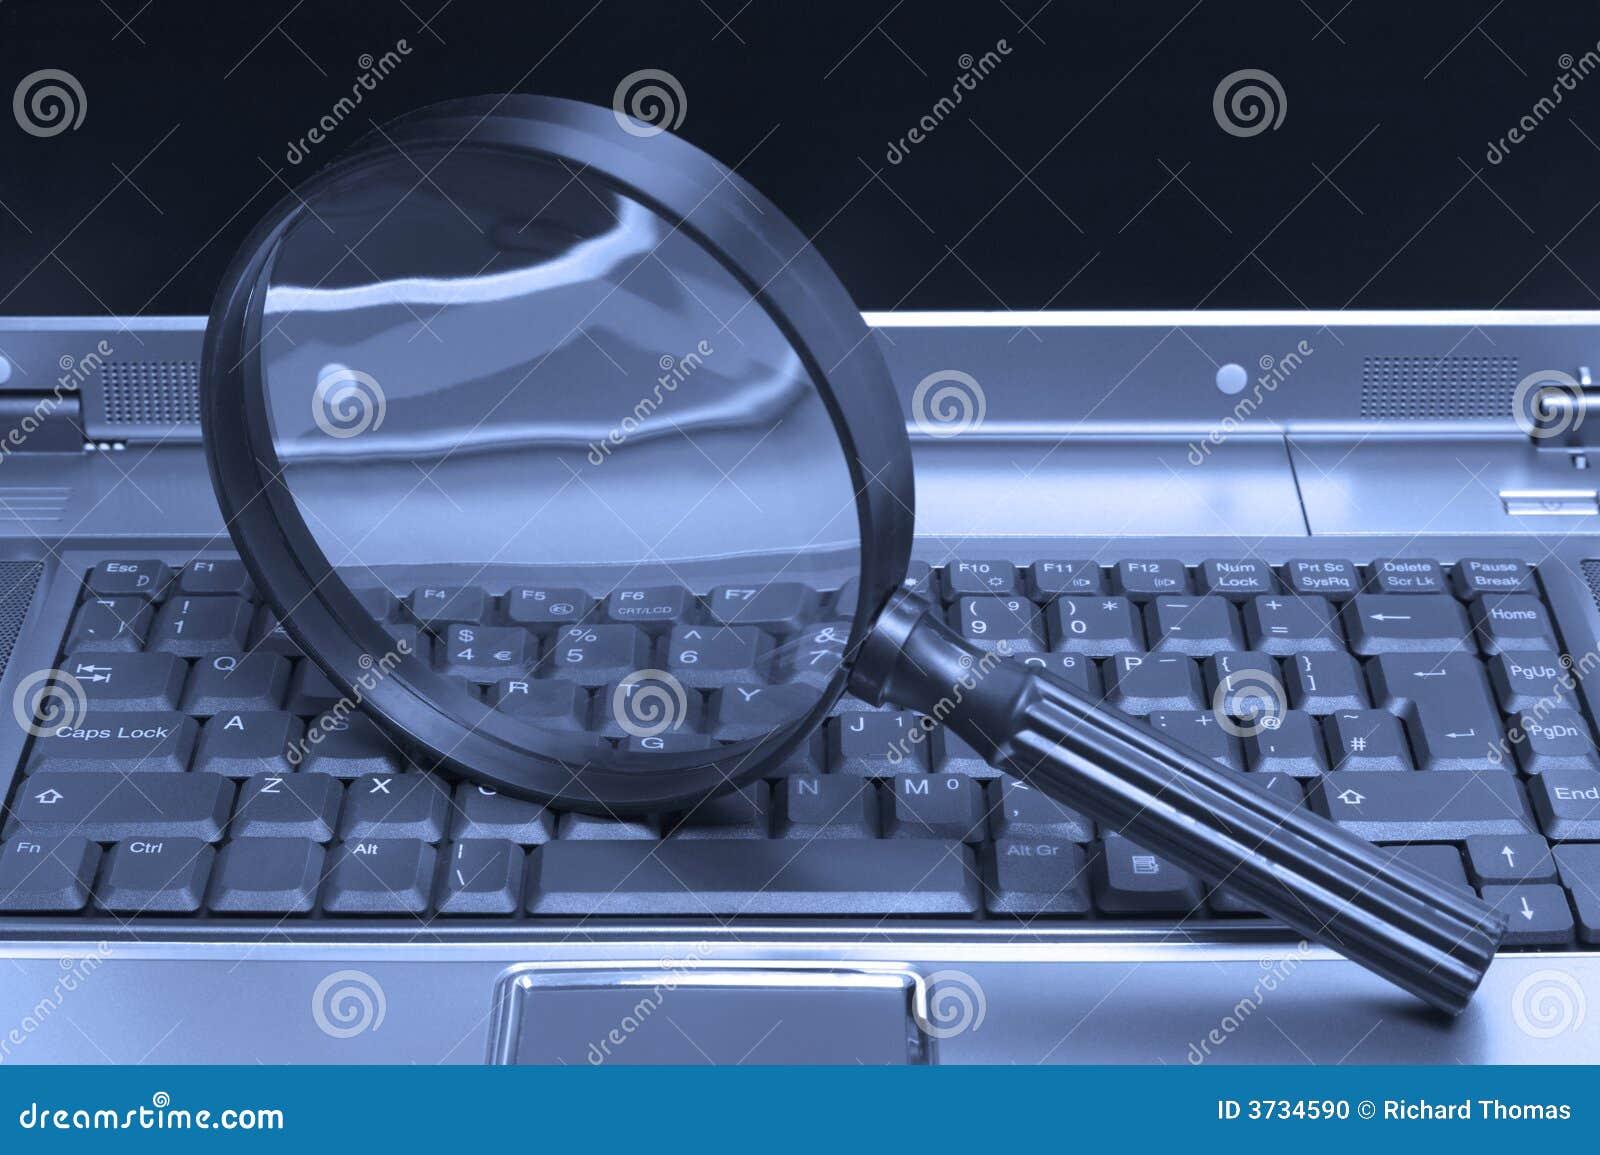 Laptop Magnifying glass